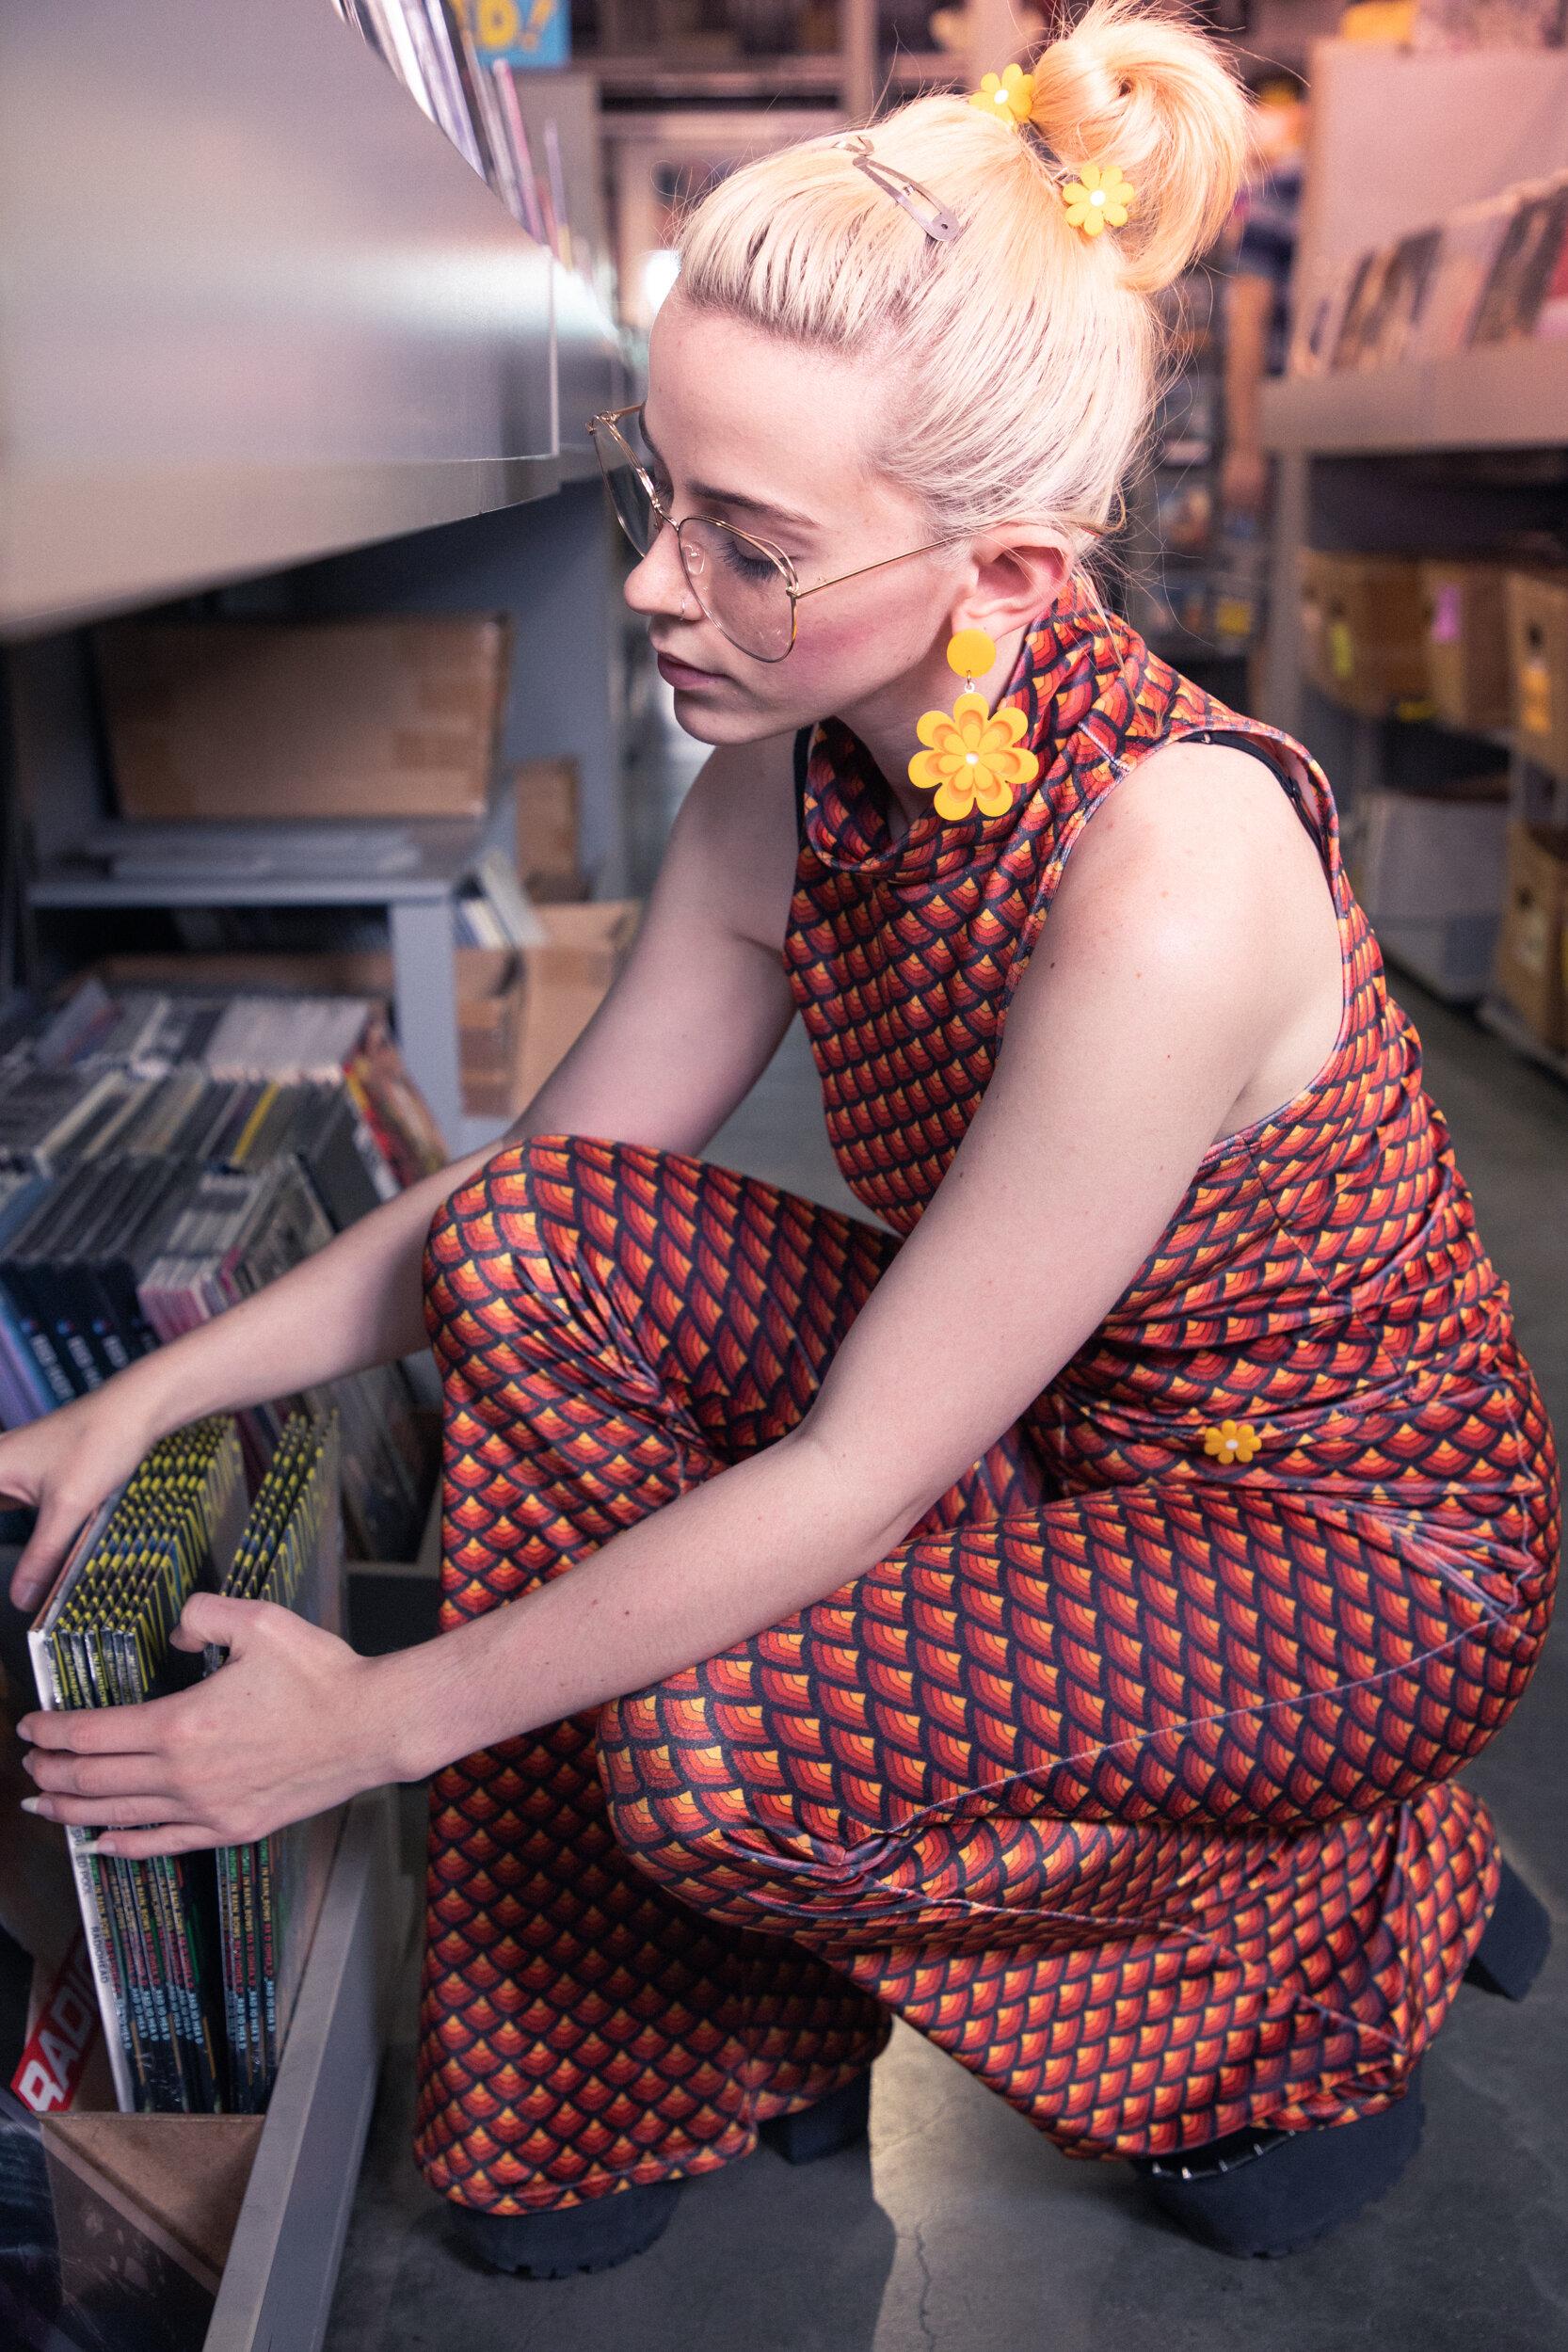 MindFlowers_Candy_Daisy_Amoeba_Fashion_LookBook-5.jpg